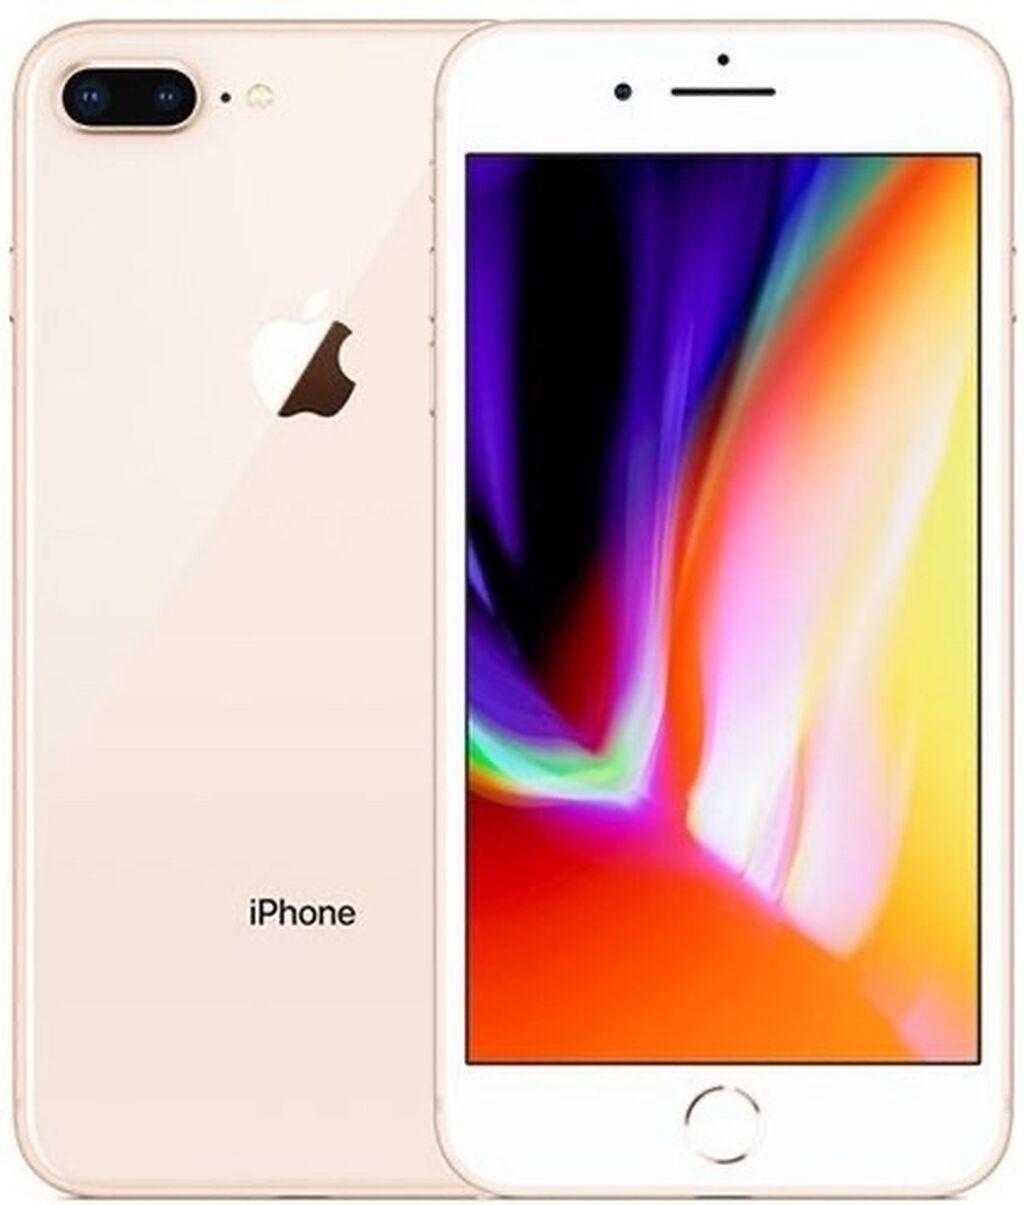 Б/У iPhone 8 Plus: Б/У iPhone 8 Plus